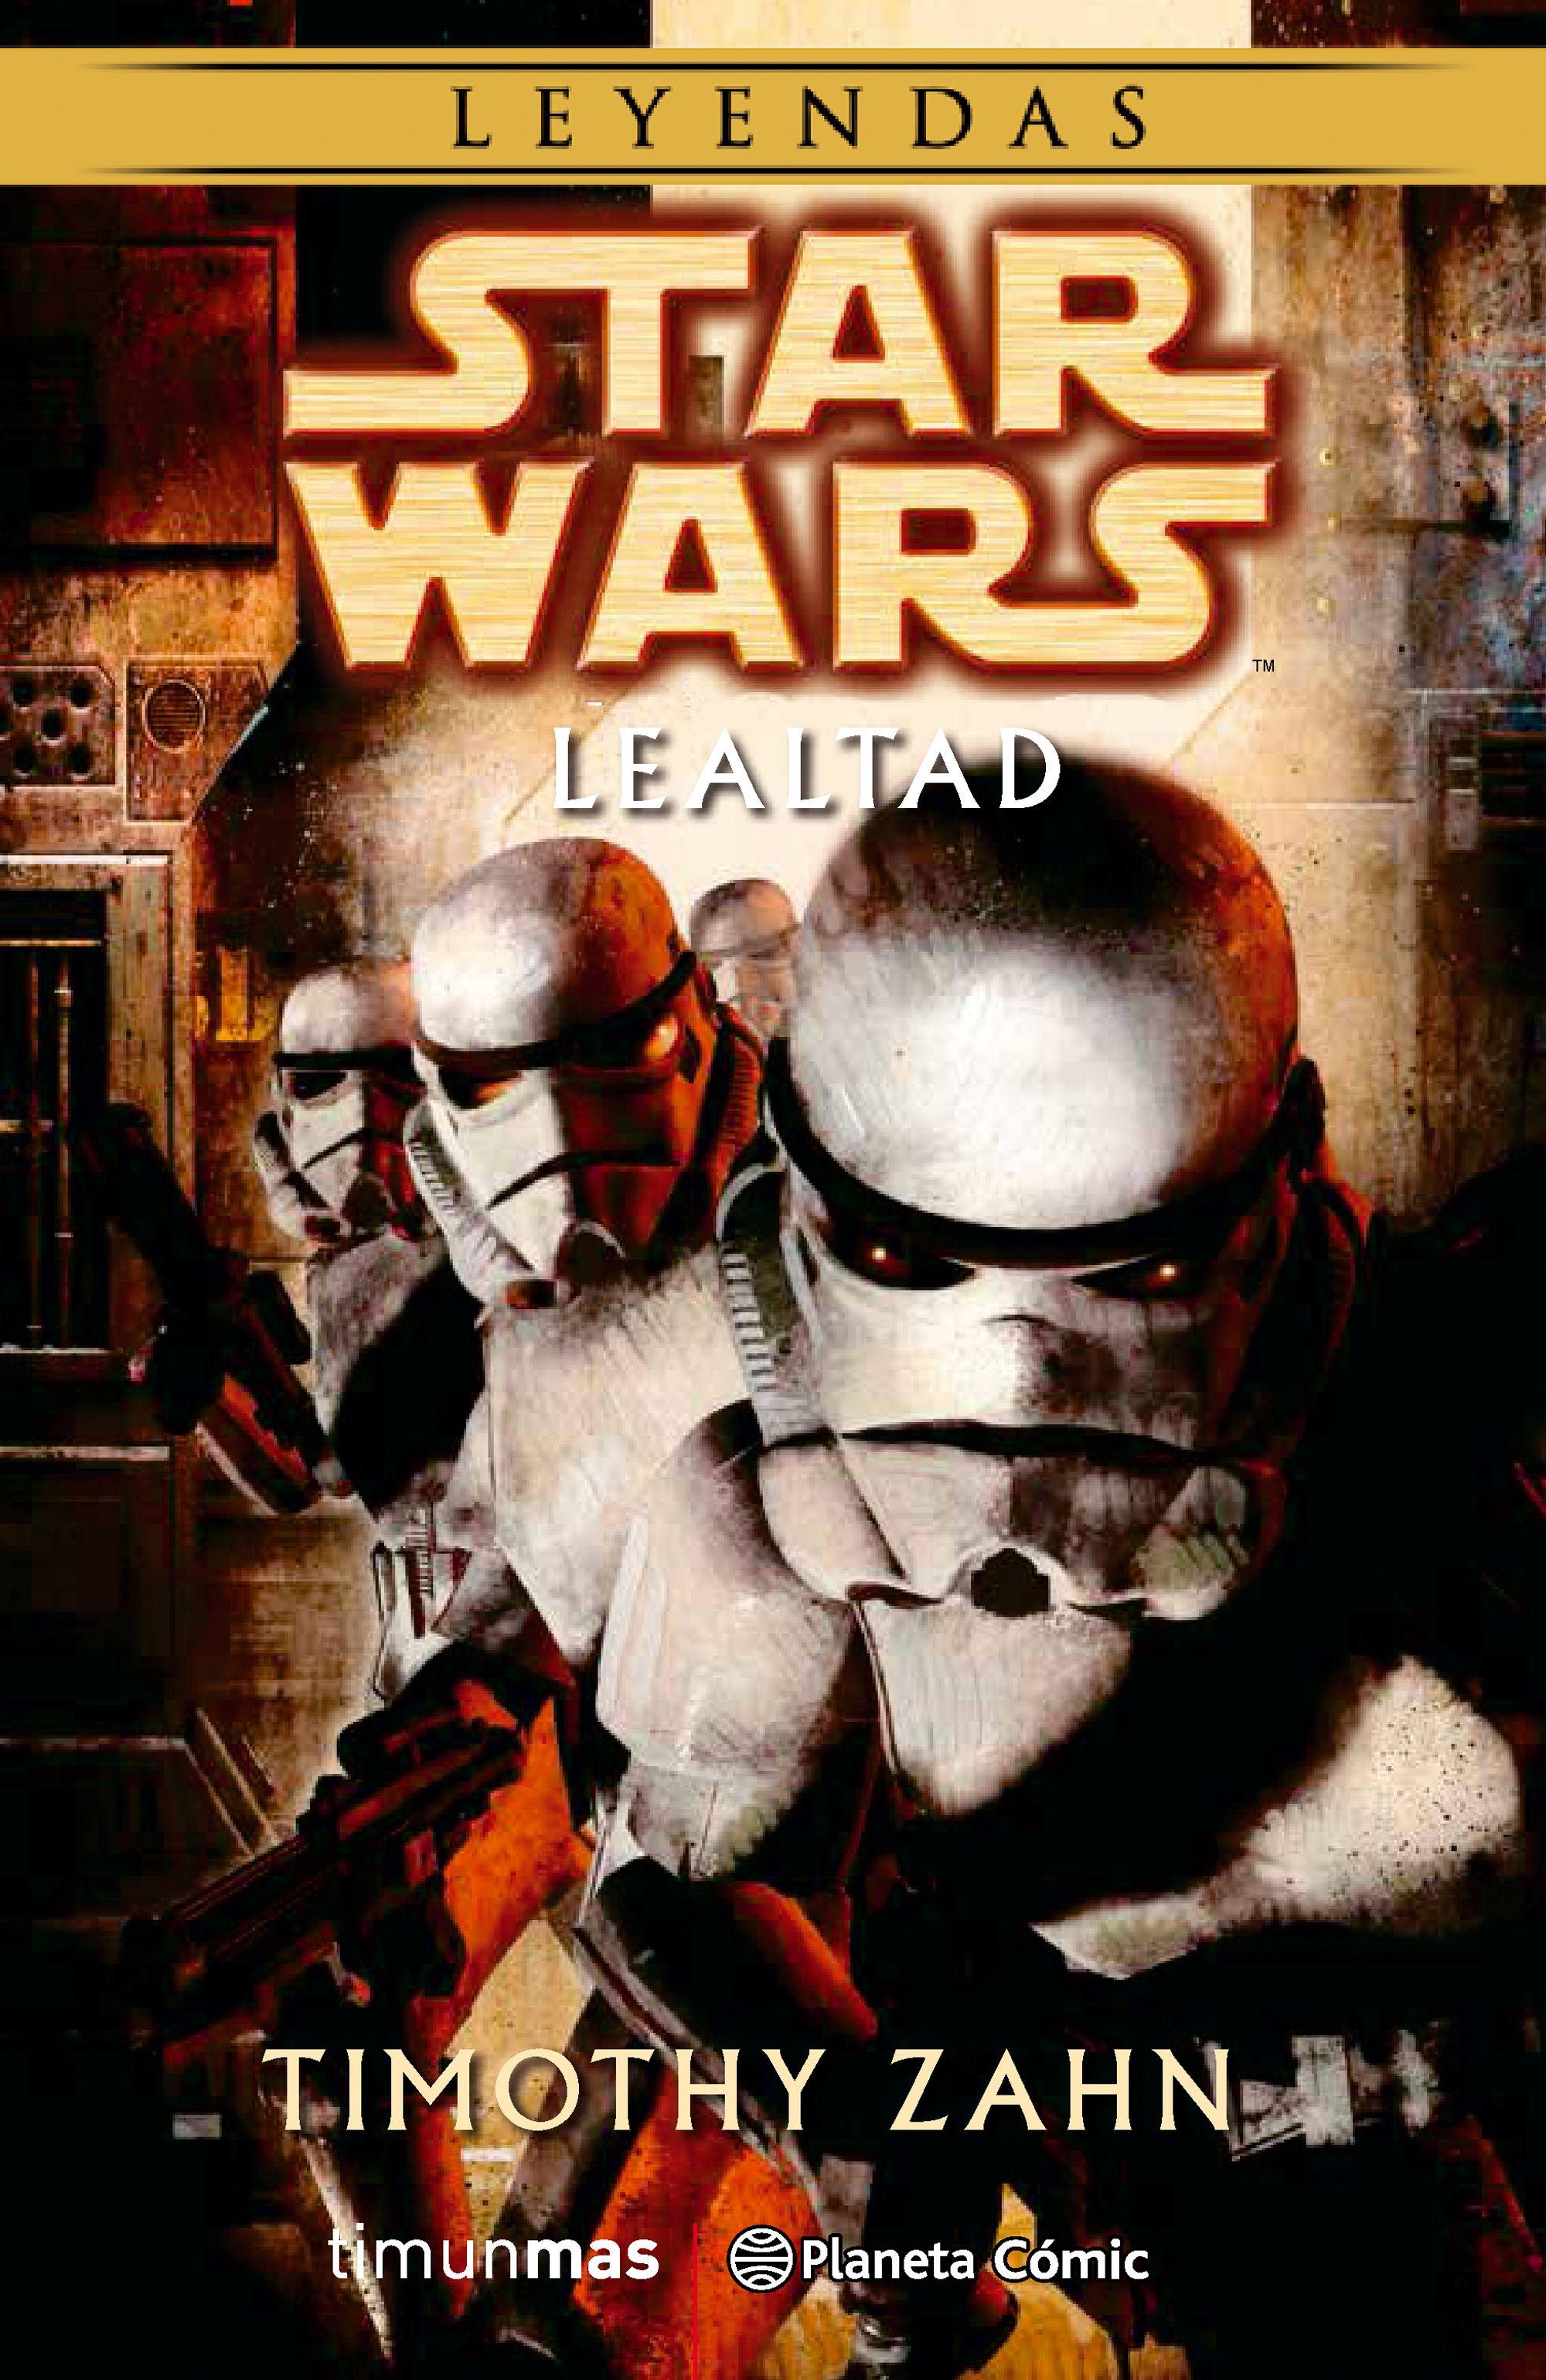 Star Wars: Lealtad